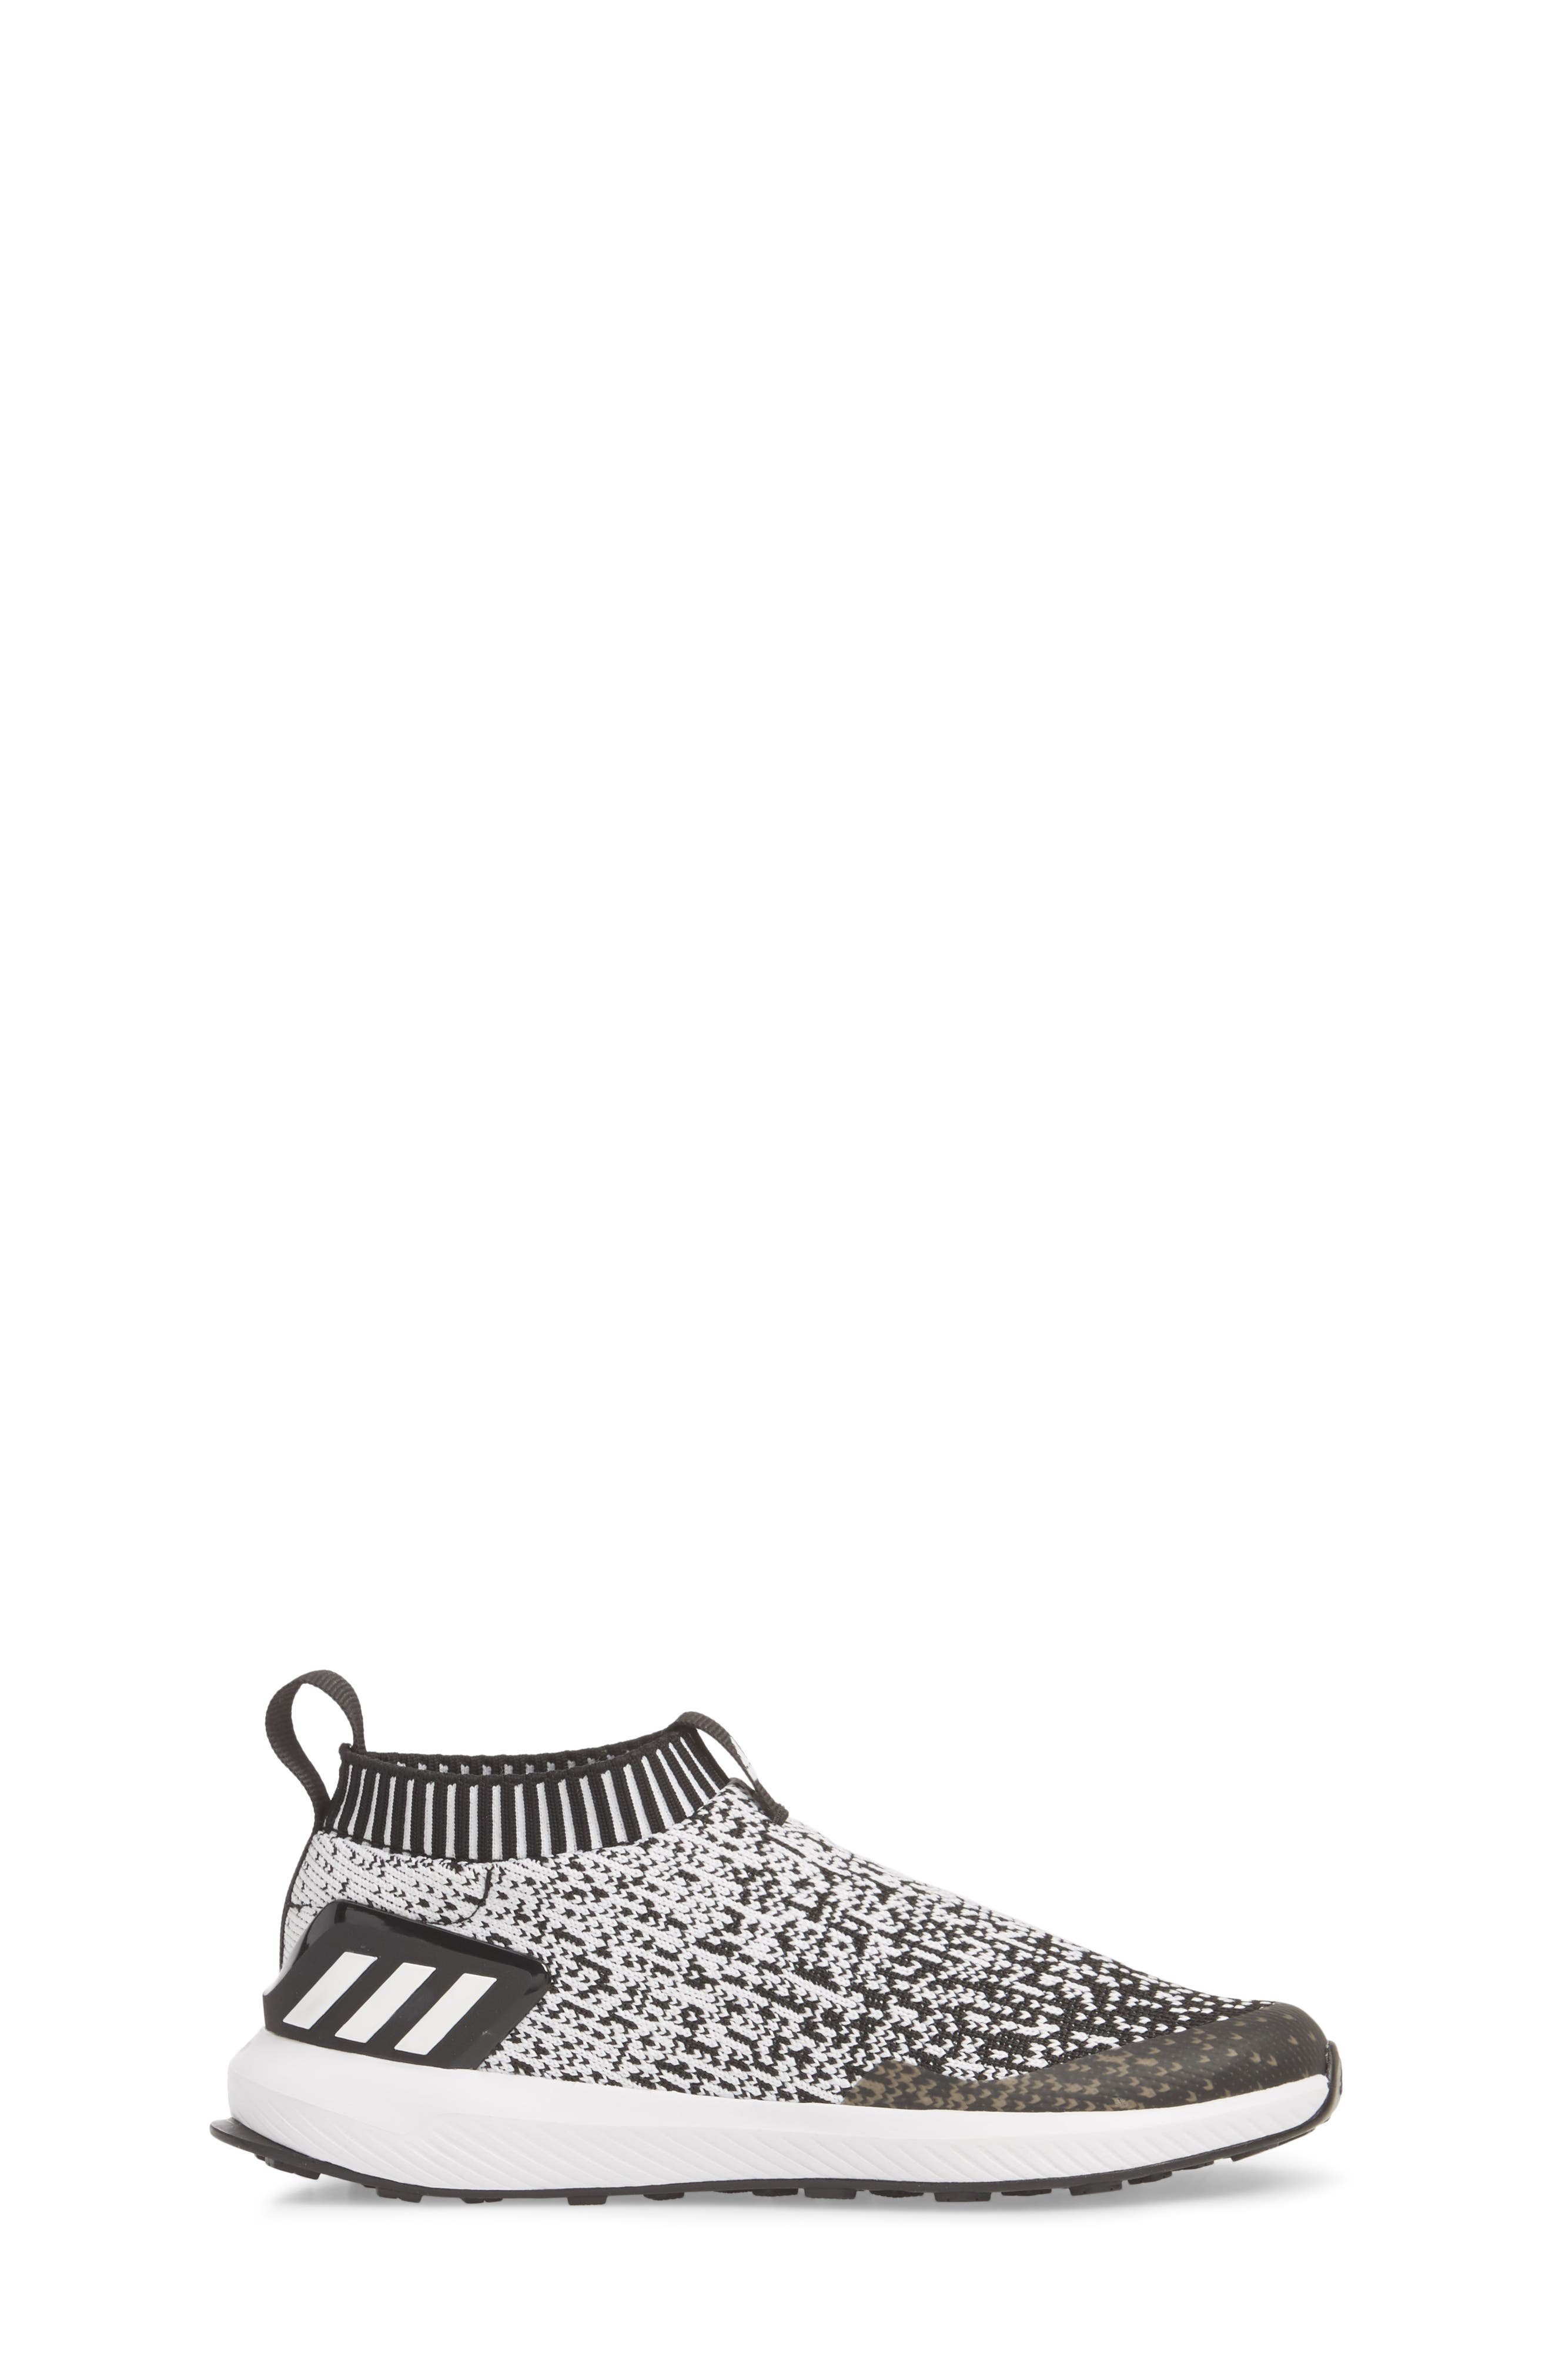 RapidaRun Laceless Knit Sneaker,                             Alternate thumbnail 3, color,                             001